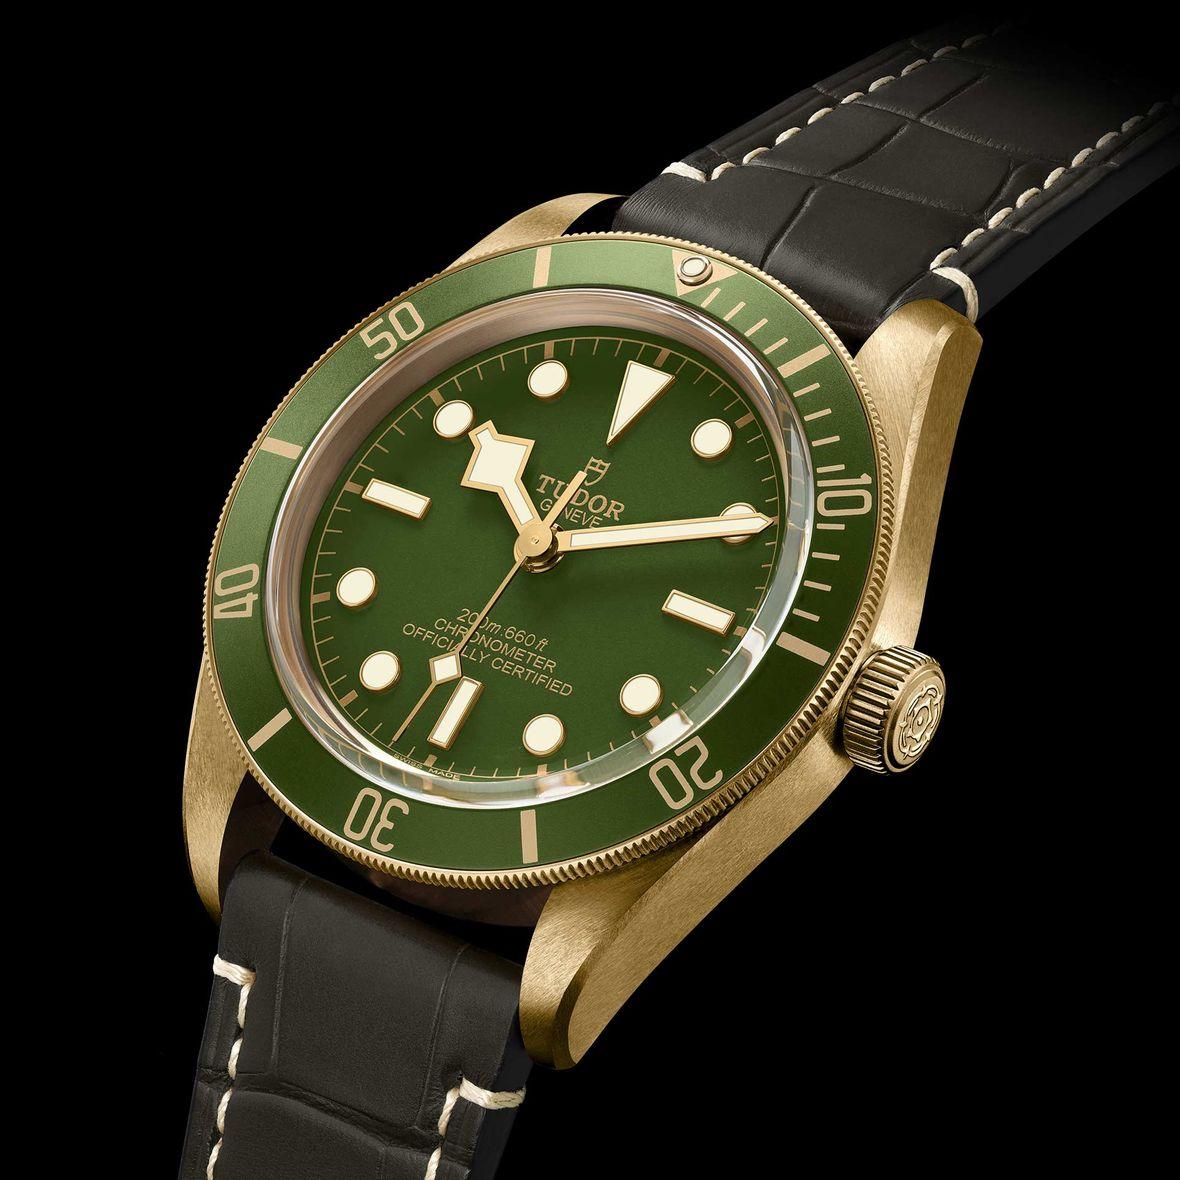 Tudor Black Bay Fifty-Eight 18k Gold